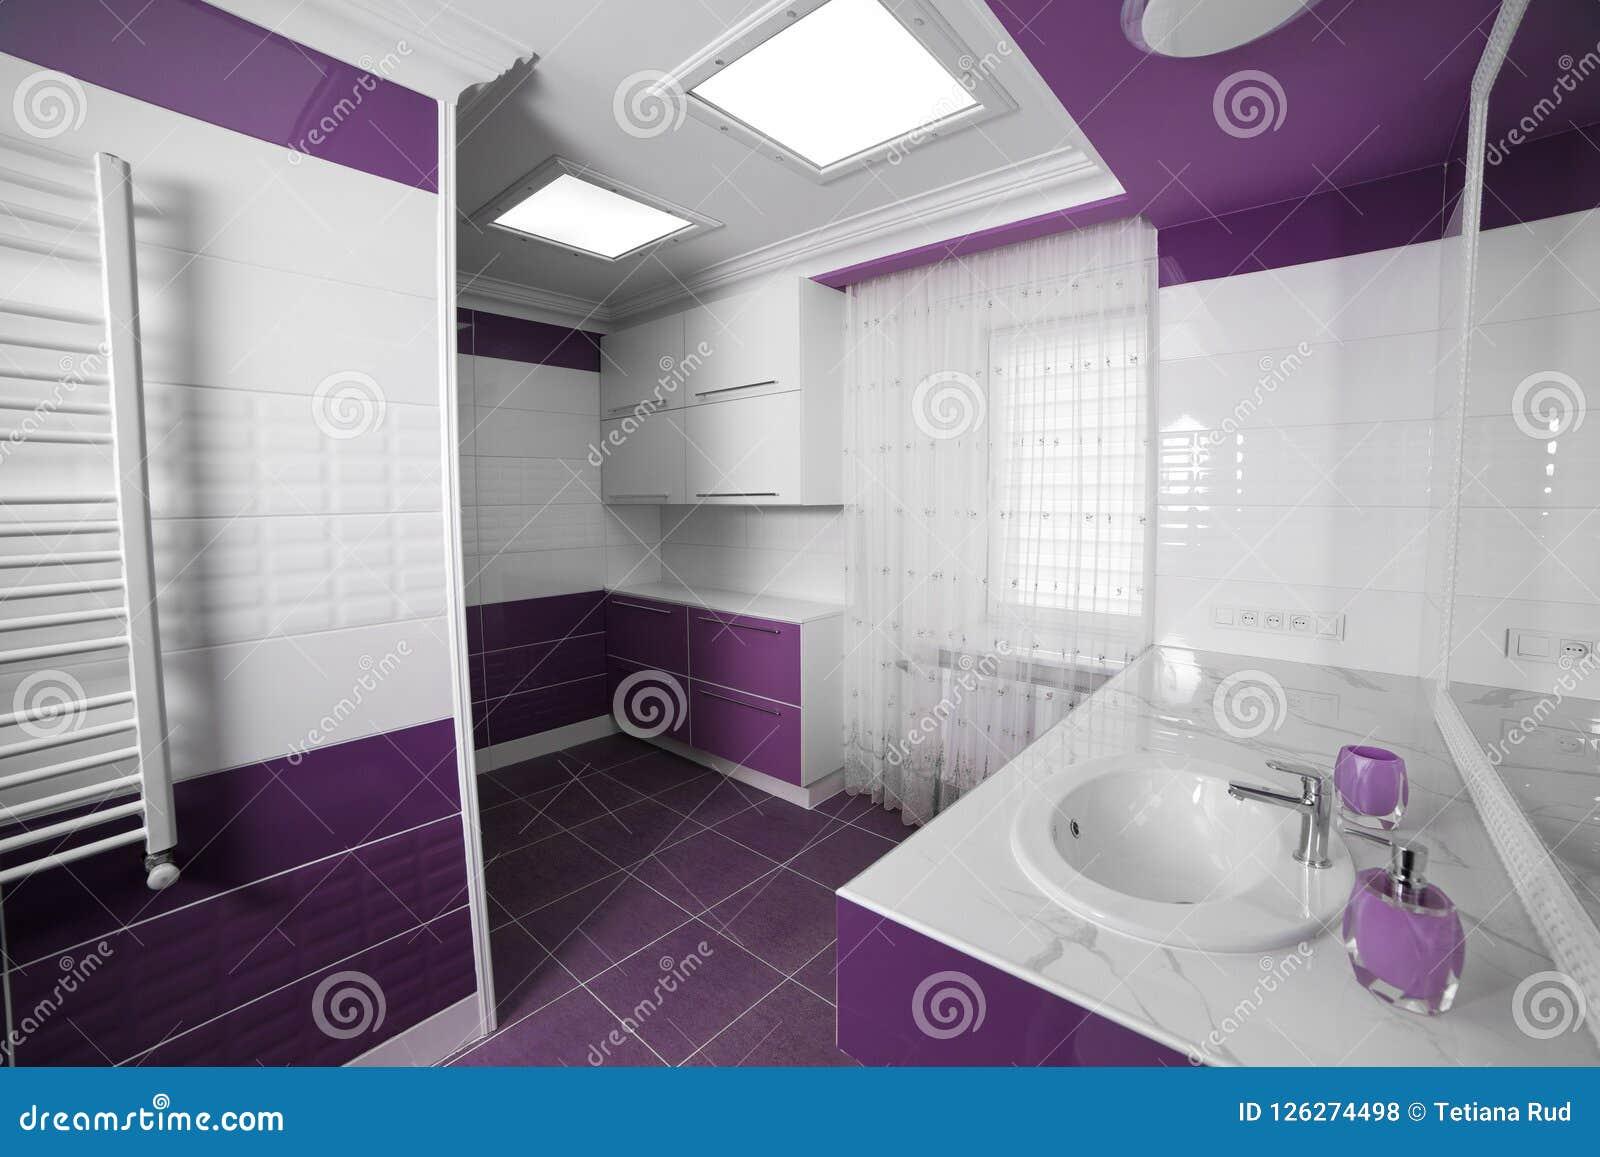 Piastrelle Bagno Mosaico Viola modern bathroom interior with a mosaic panel. stock photo